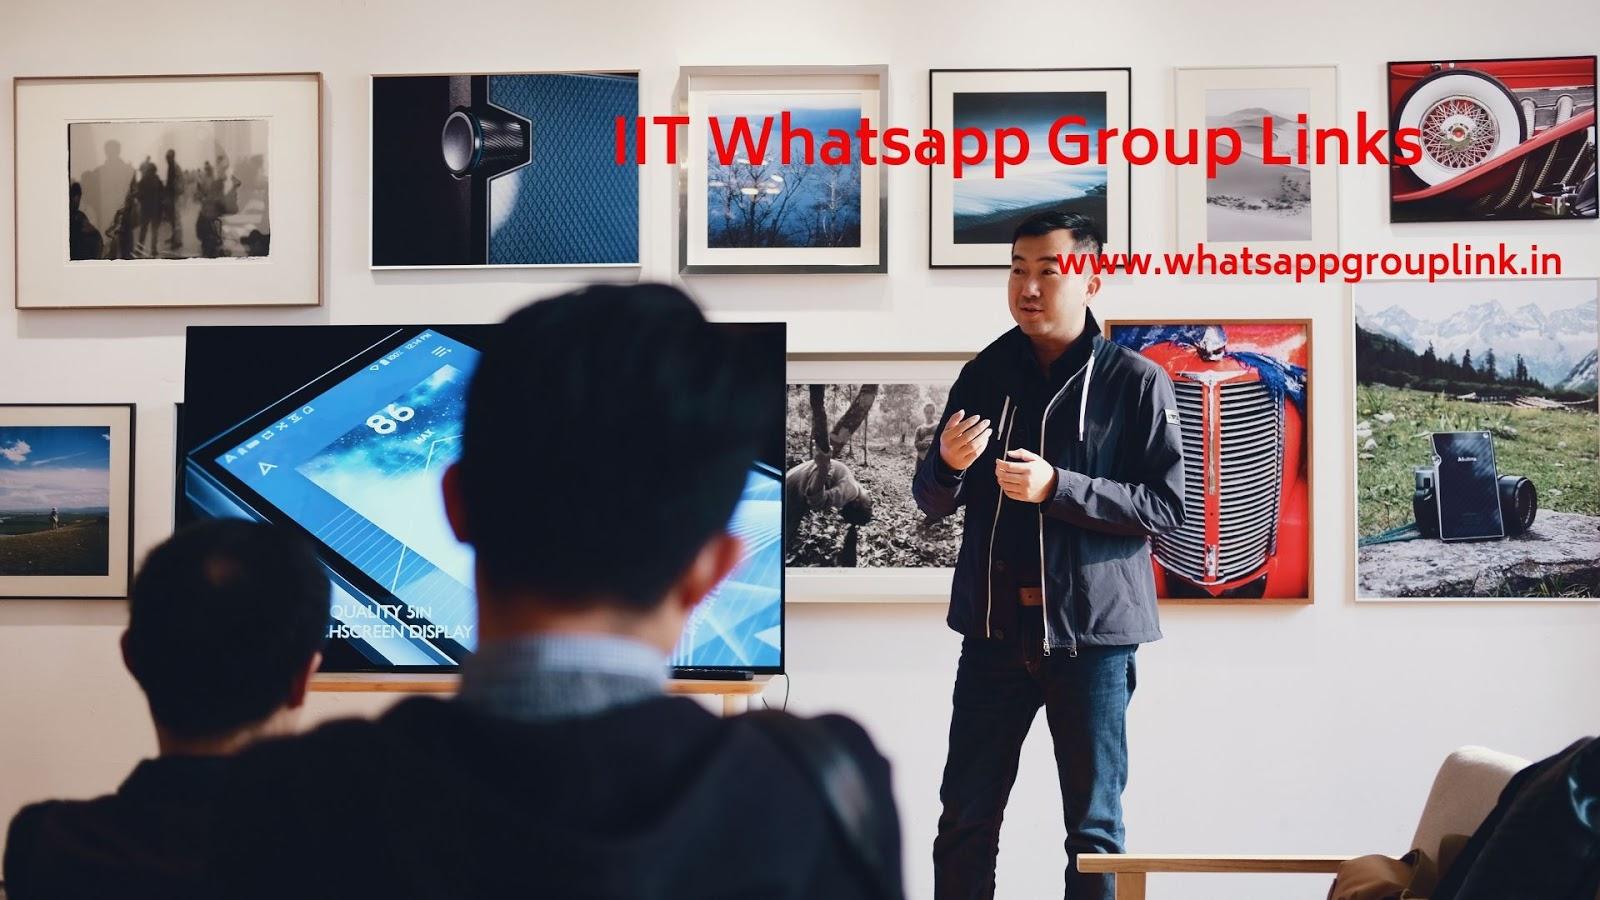 Whatsapp Group Link: IIT Whatsapp Group Links